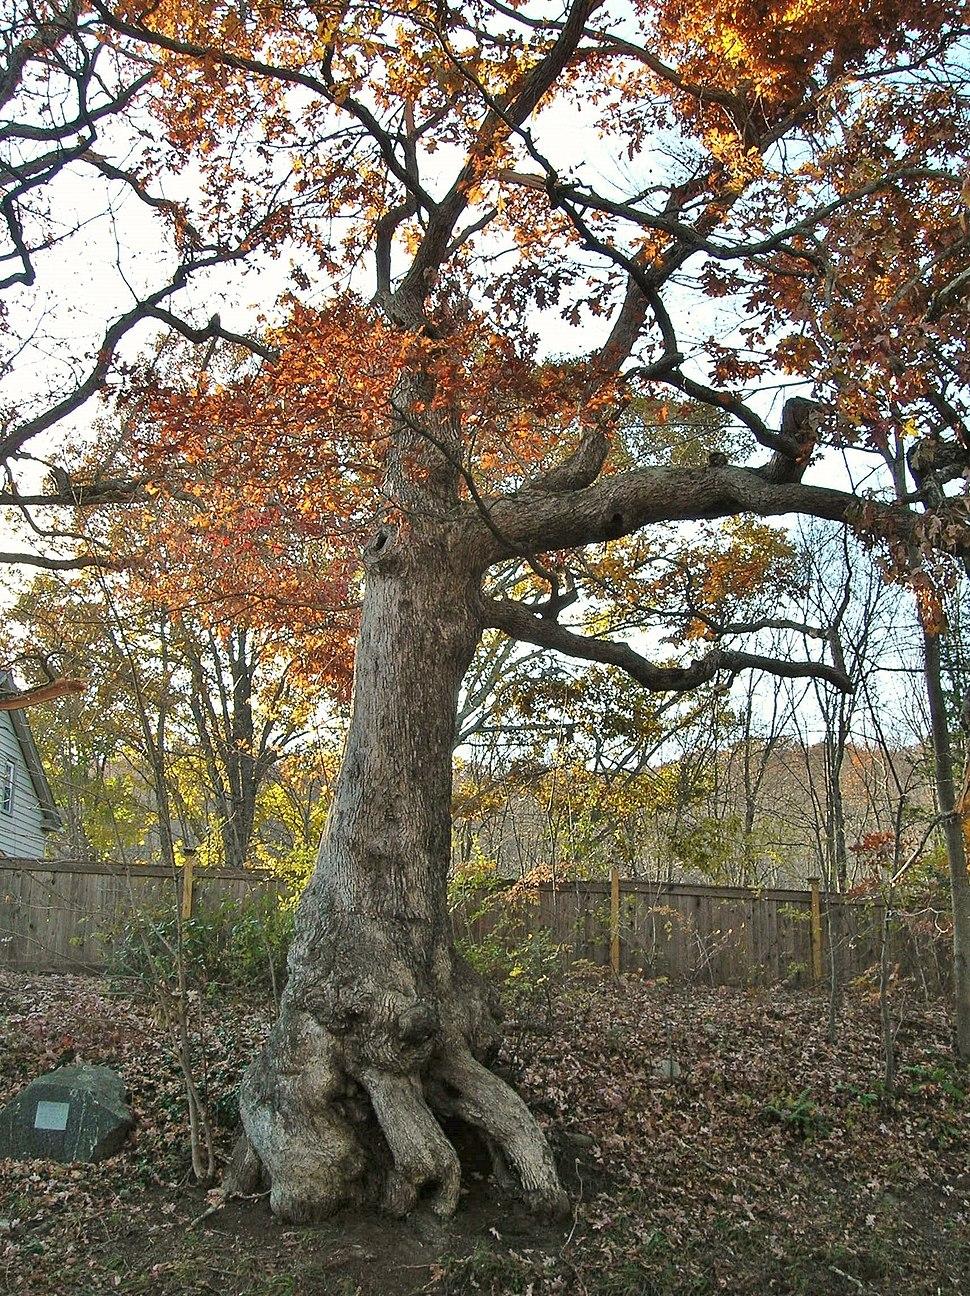 Peaceable Oak, Bristol, CT - November 8, 2011